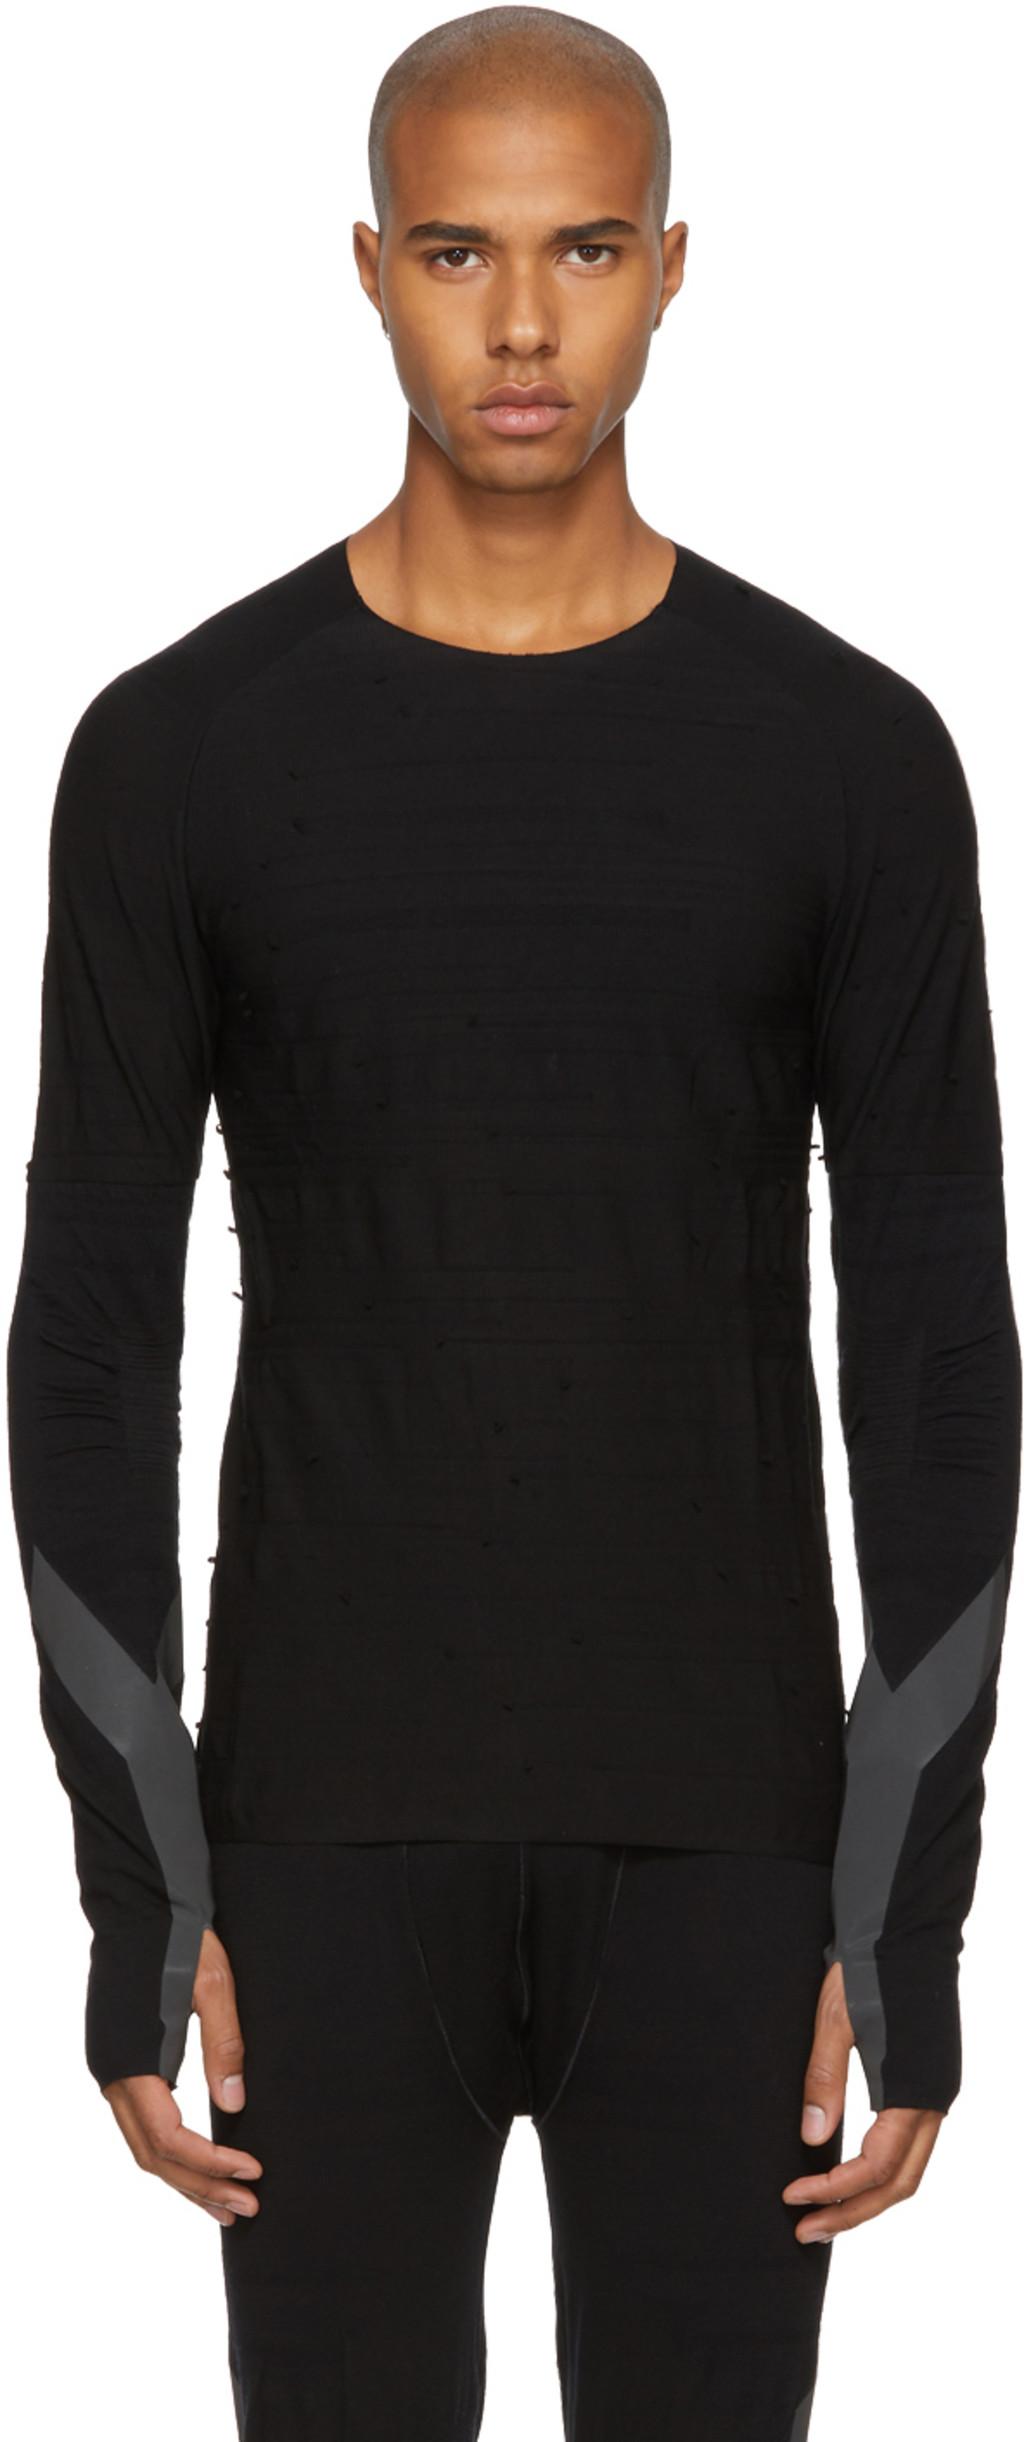 Black t shirt back and front plain - Black T Shirt Back And Front Plain 36